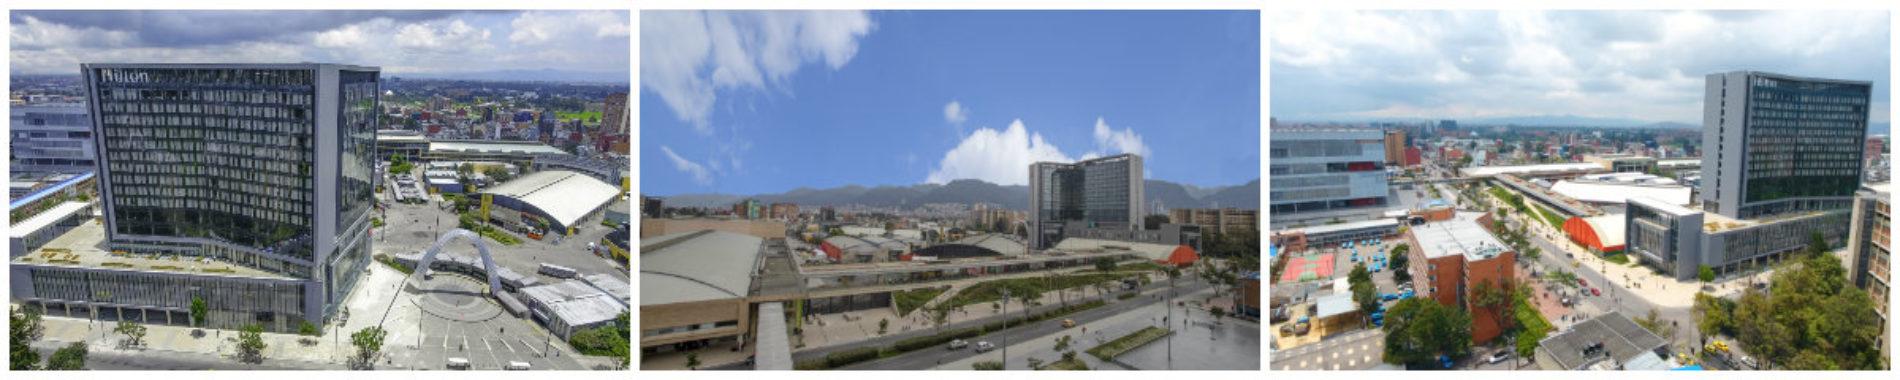 Hotel Hilton Bogotá Corferias